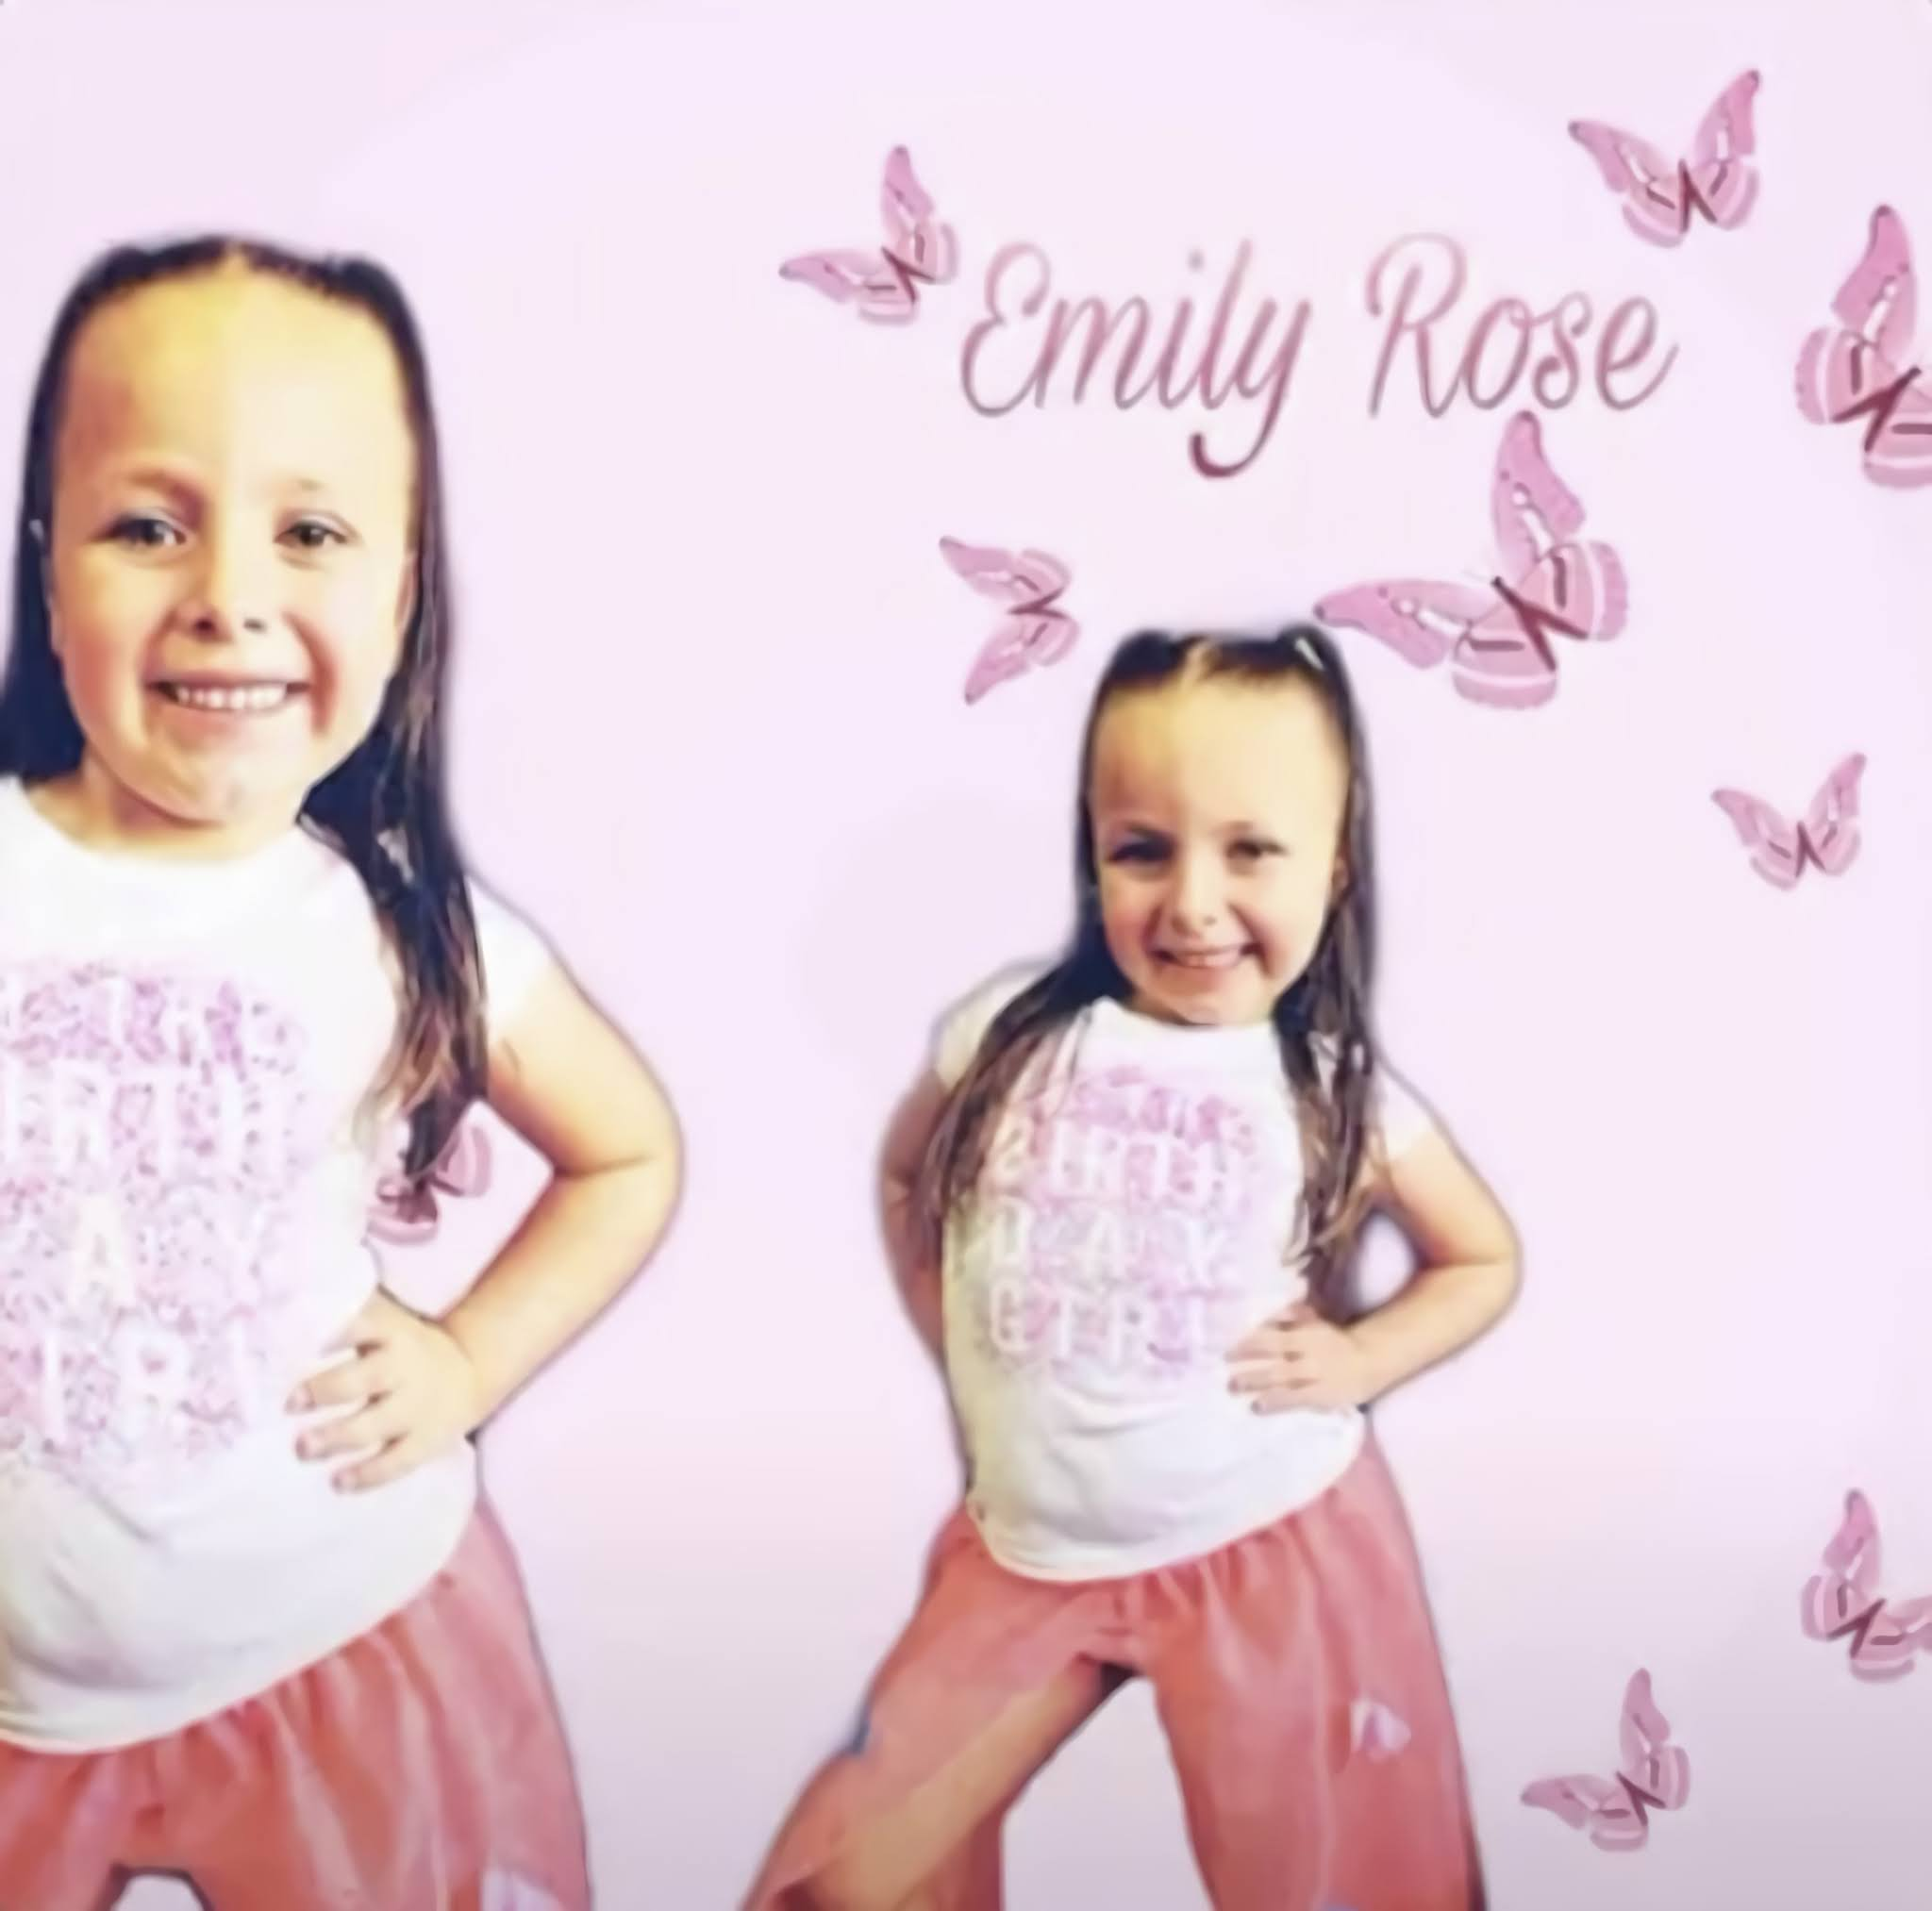 Emily Montes's 'Emily Rose' album cover